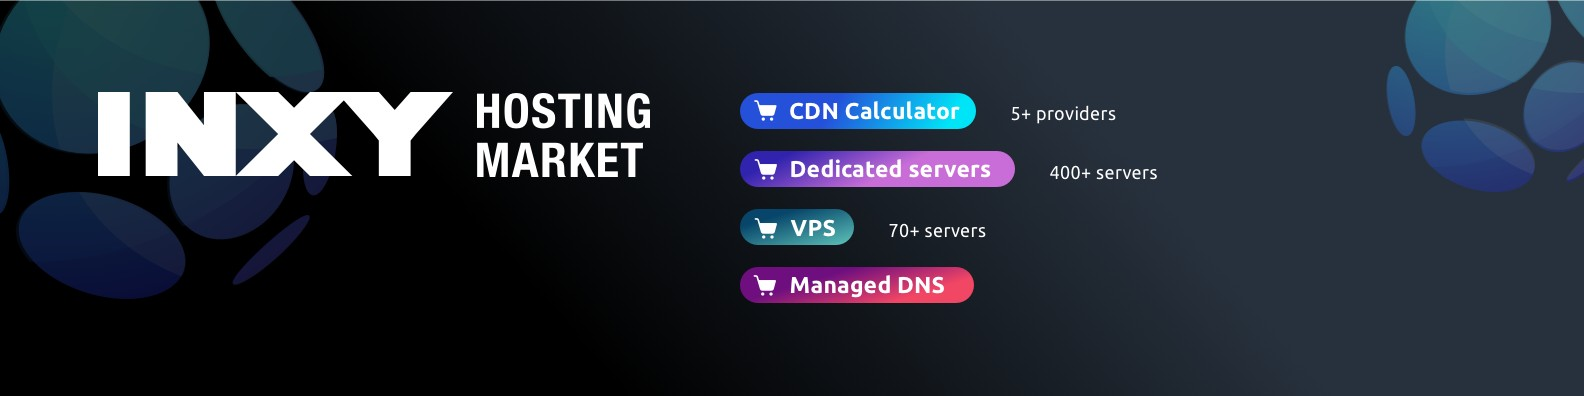 INXY Hosting Services | LinkedIn